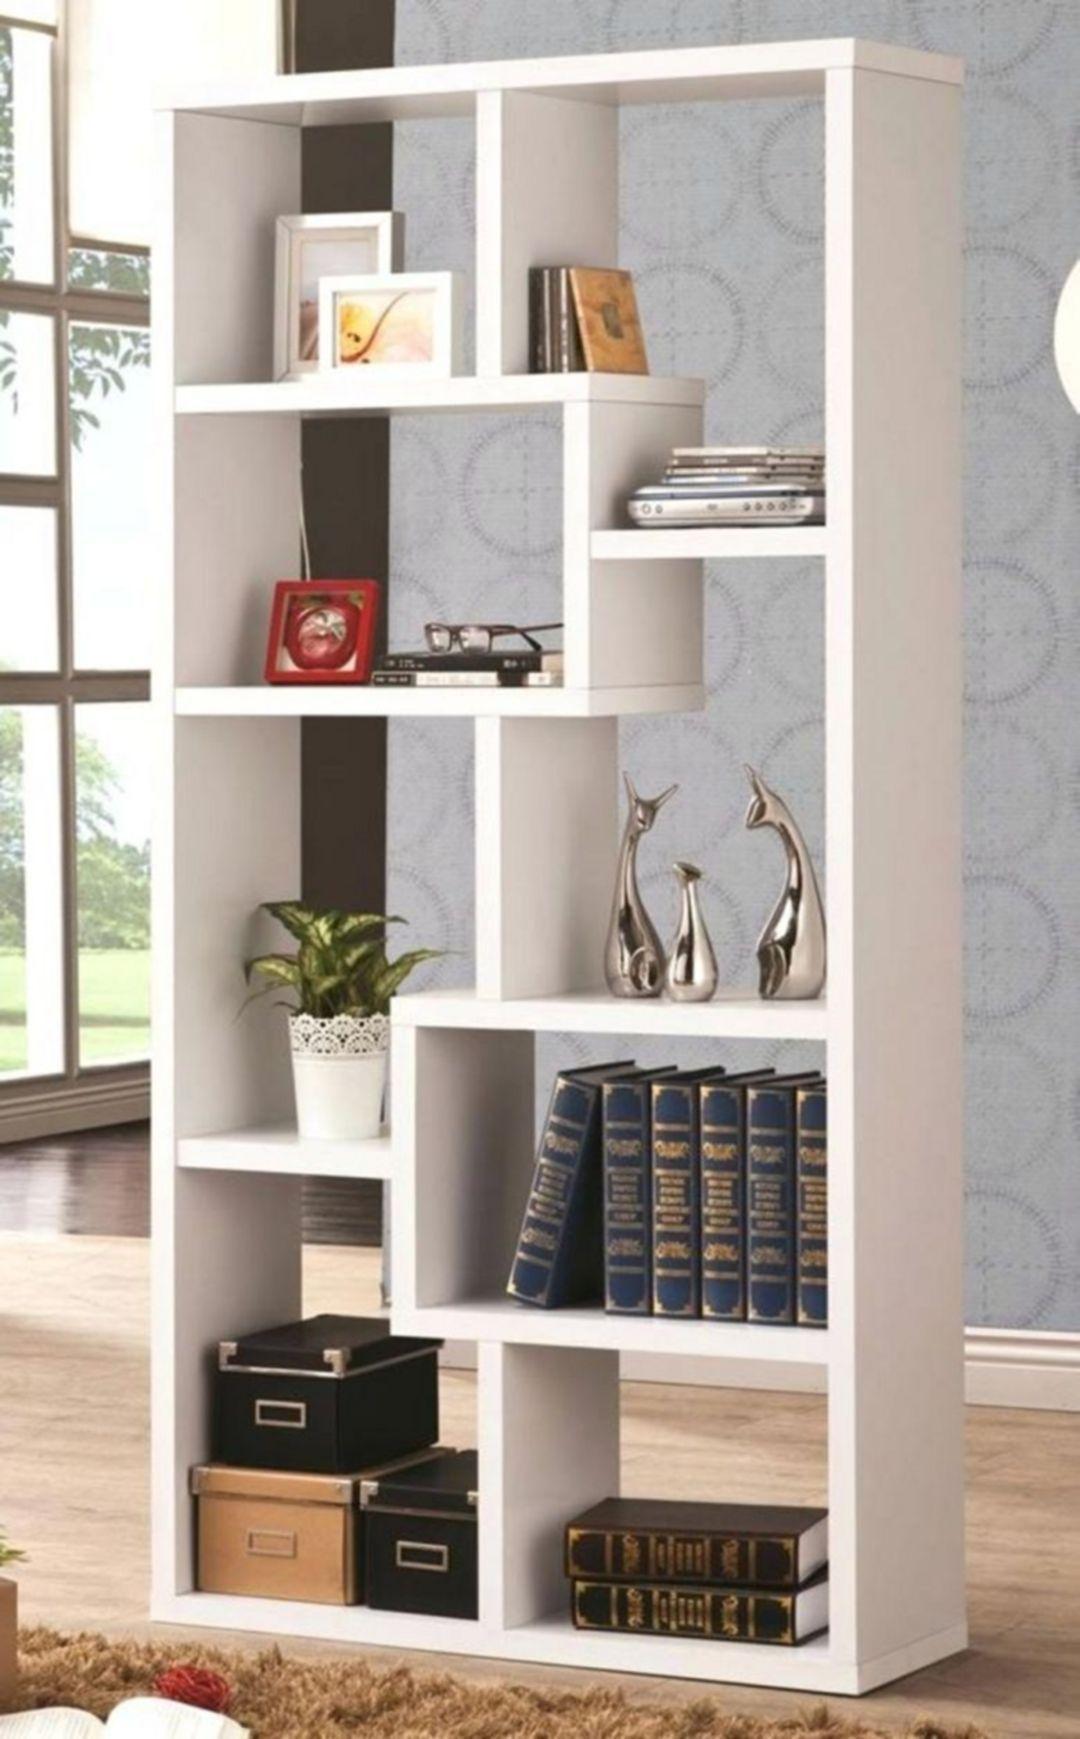 Cool Home Library Ideas: 15 Awesome Creative Minimalist Bookshelf Design Ideas For